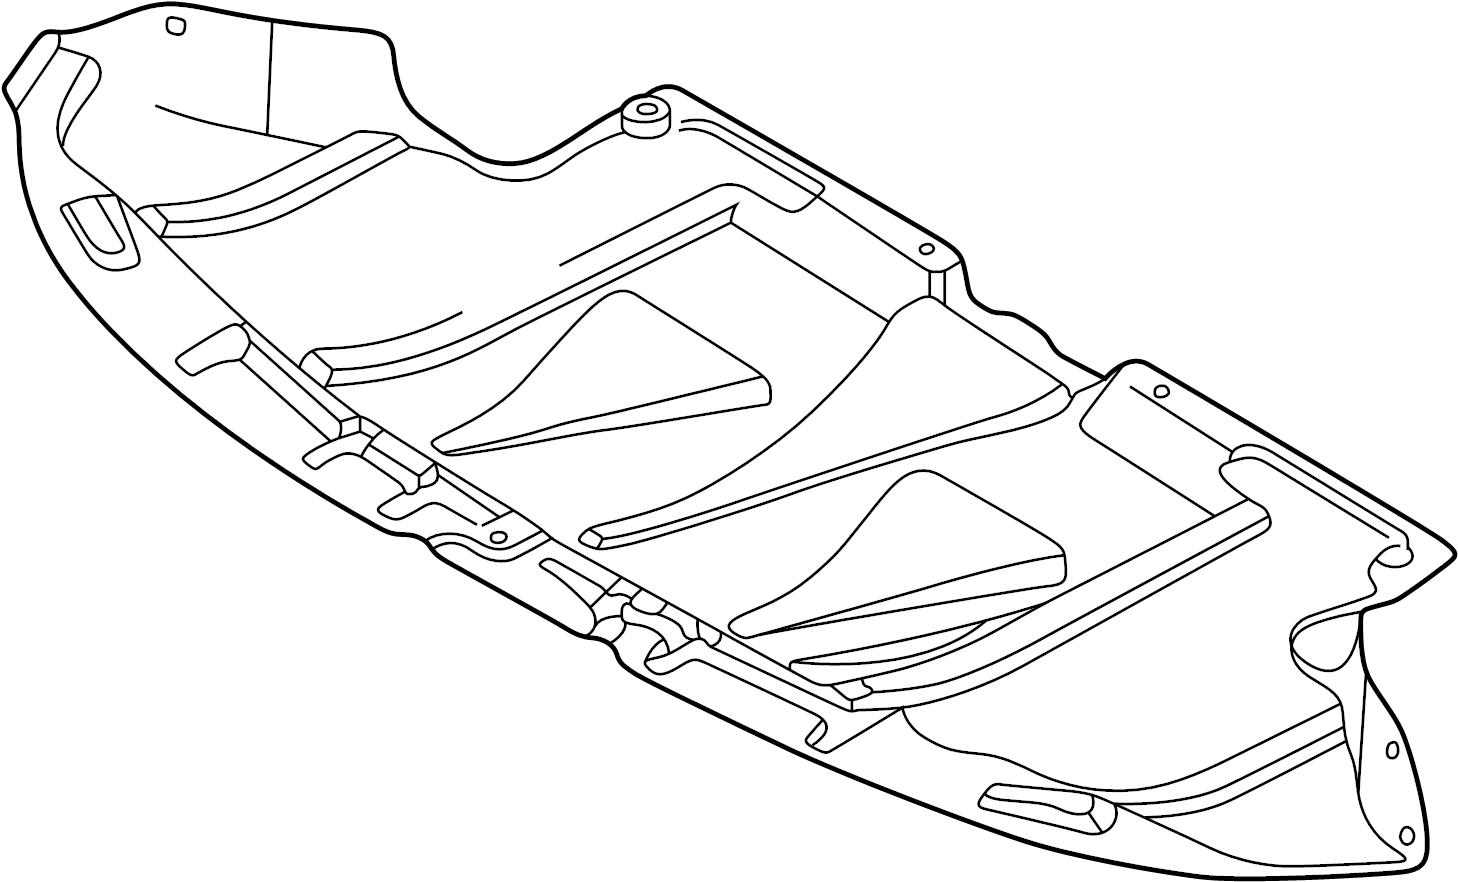 2002 volkswagen passat wagon radiator support splash shield  front  lower   2 8 liter  new style